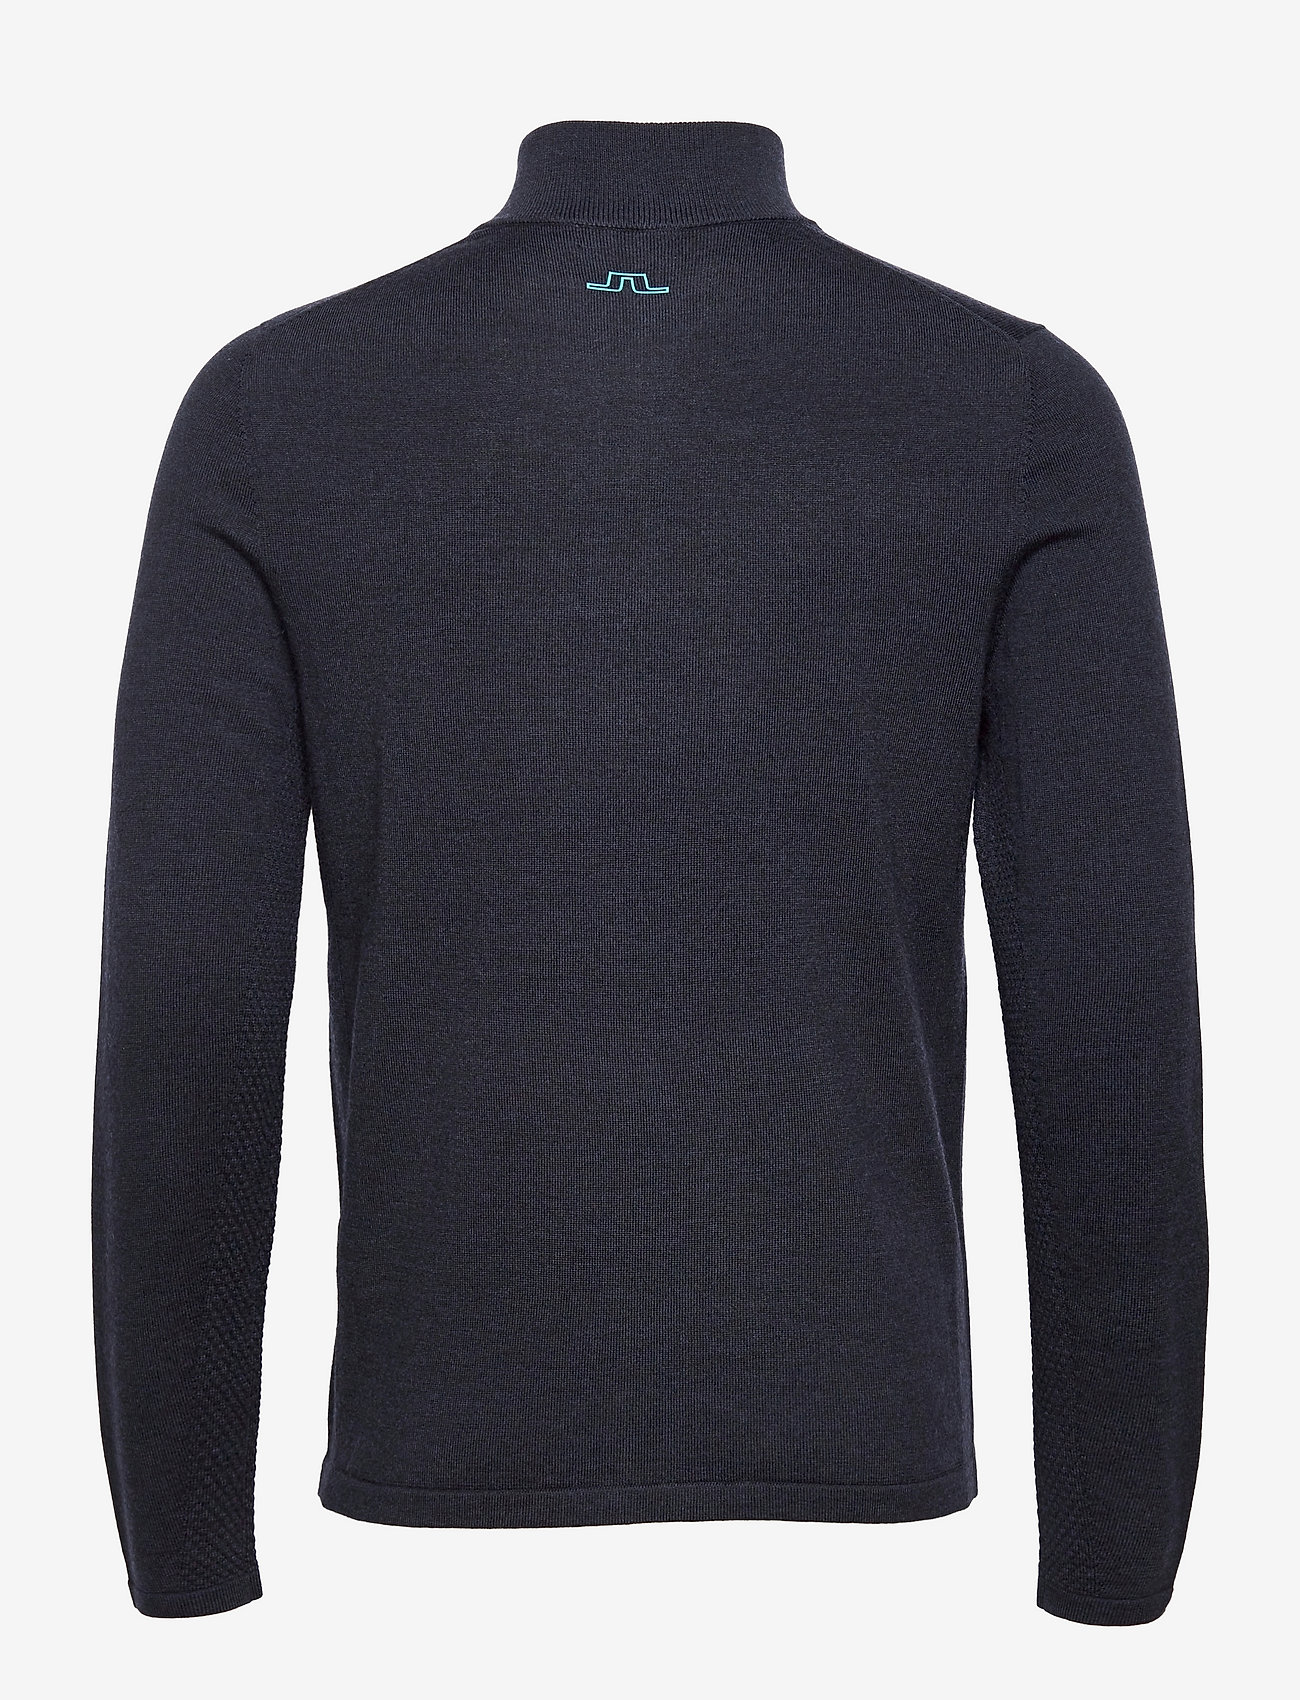 J. Lindeberg Golf - Max Zipped Golf Sweater - half zip - jl navy melange - 1